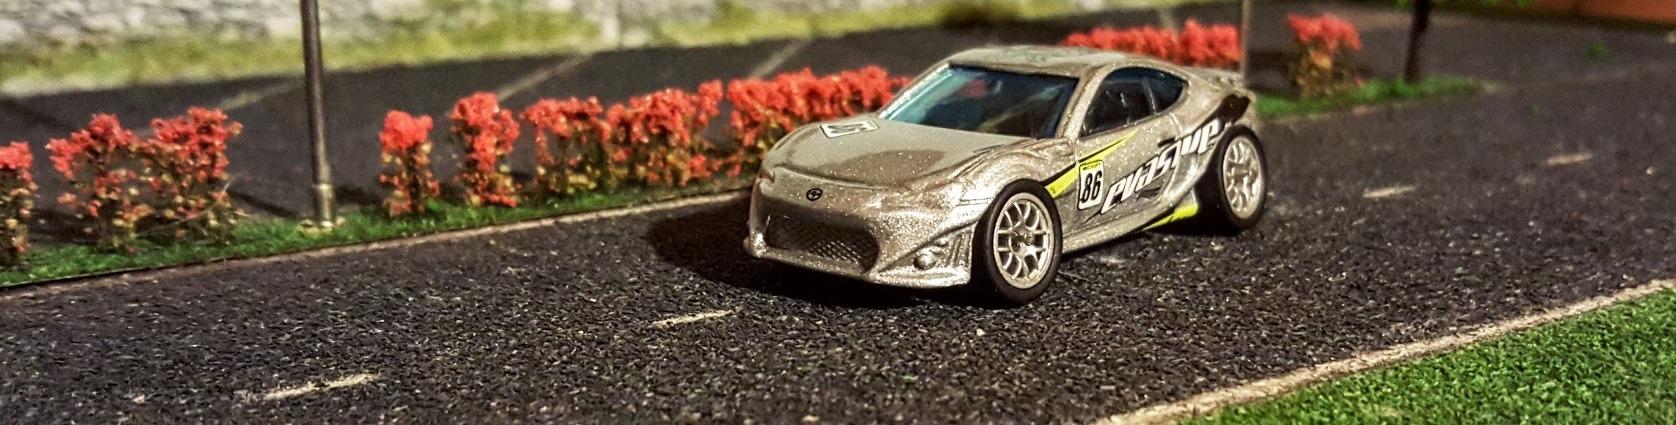 Enkei Wheels on a Toyota GT86 | Scion FR-S